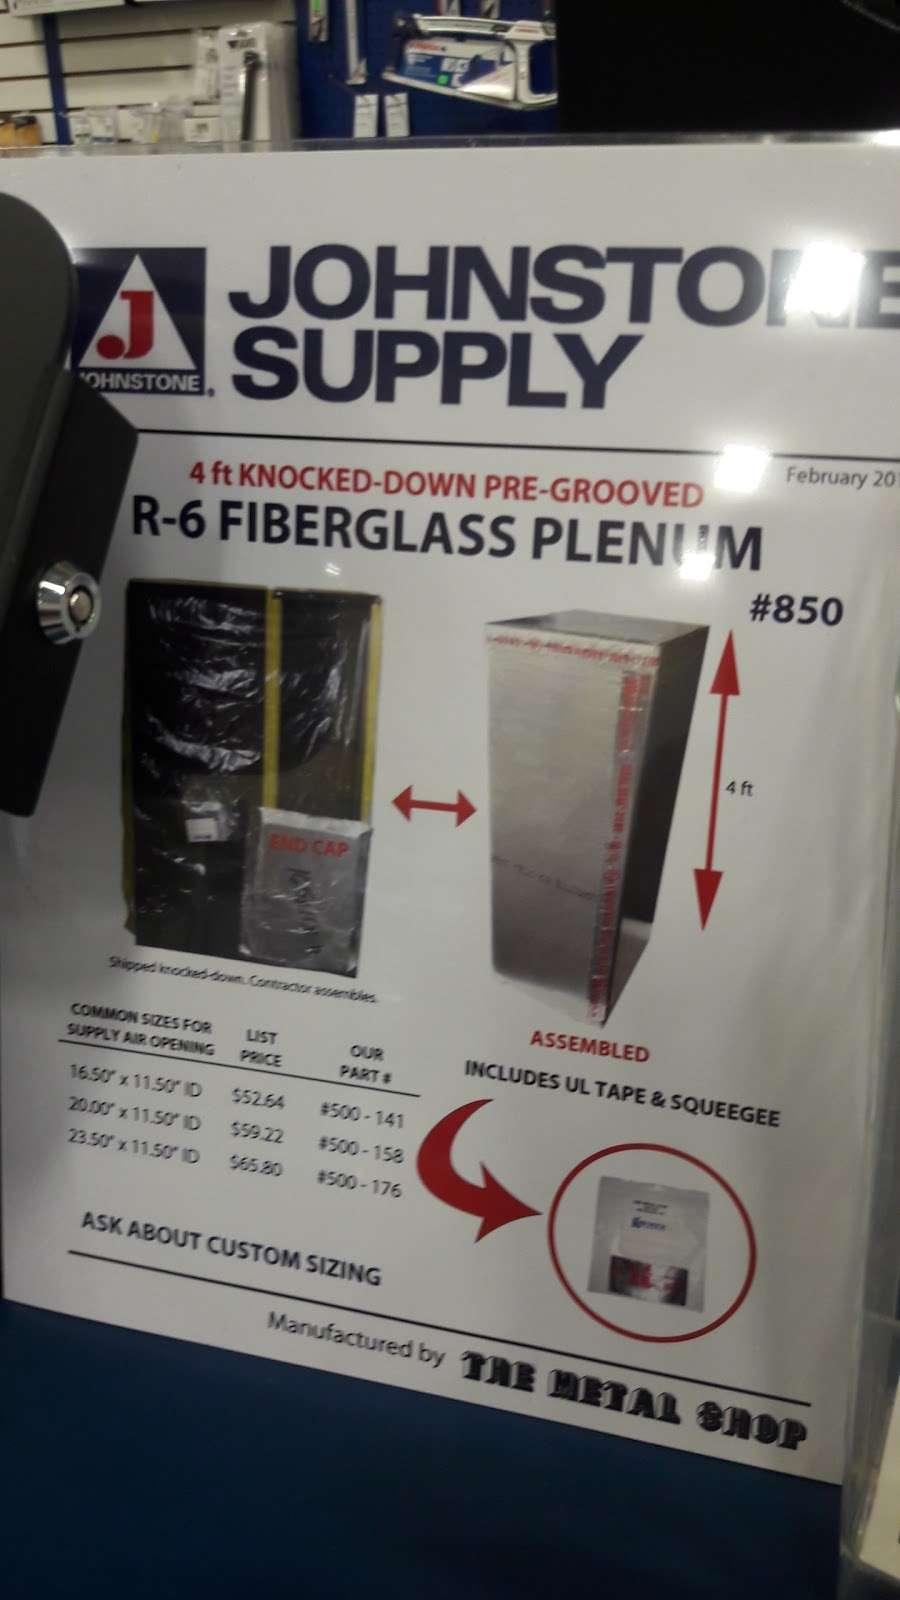 Pro Wrap Systems - store    Photo 3 of 7   Address: 4530 N Hiatus Rd, Ste 116, Sunrise, FL 33351, USA   Phone: (754) 206-4291